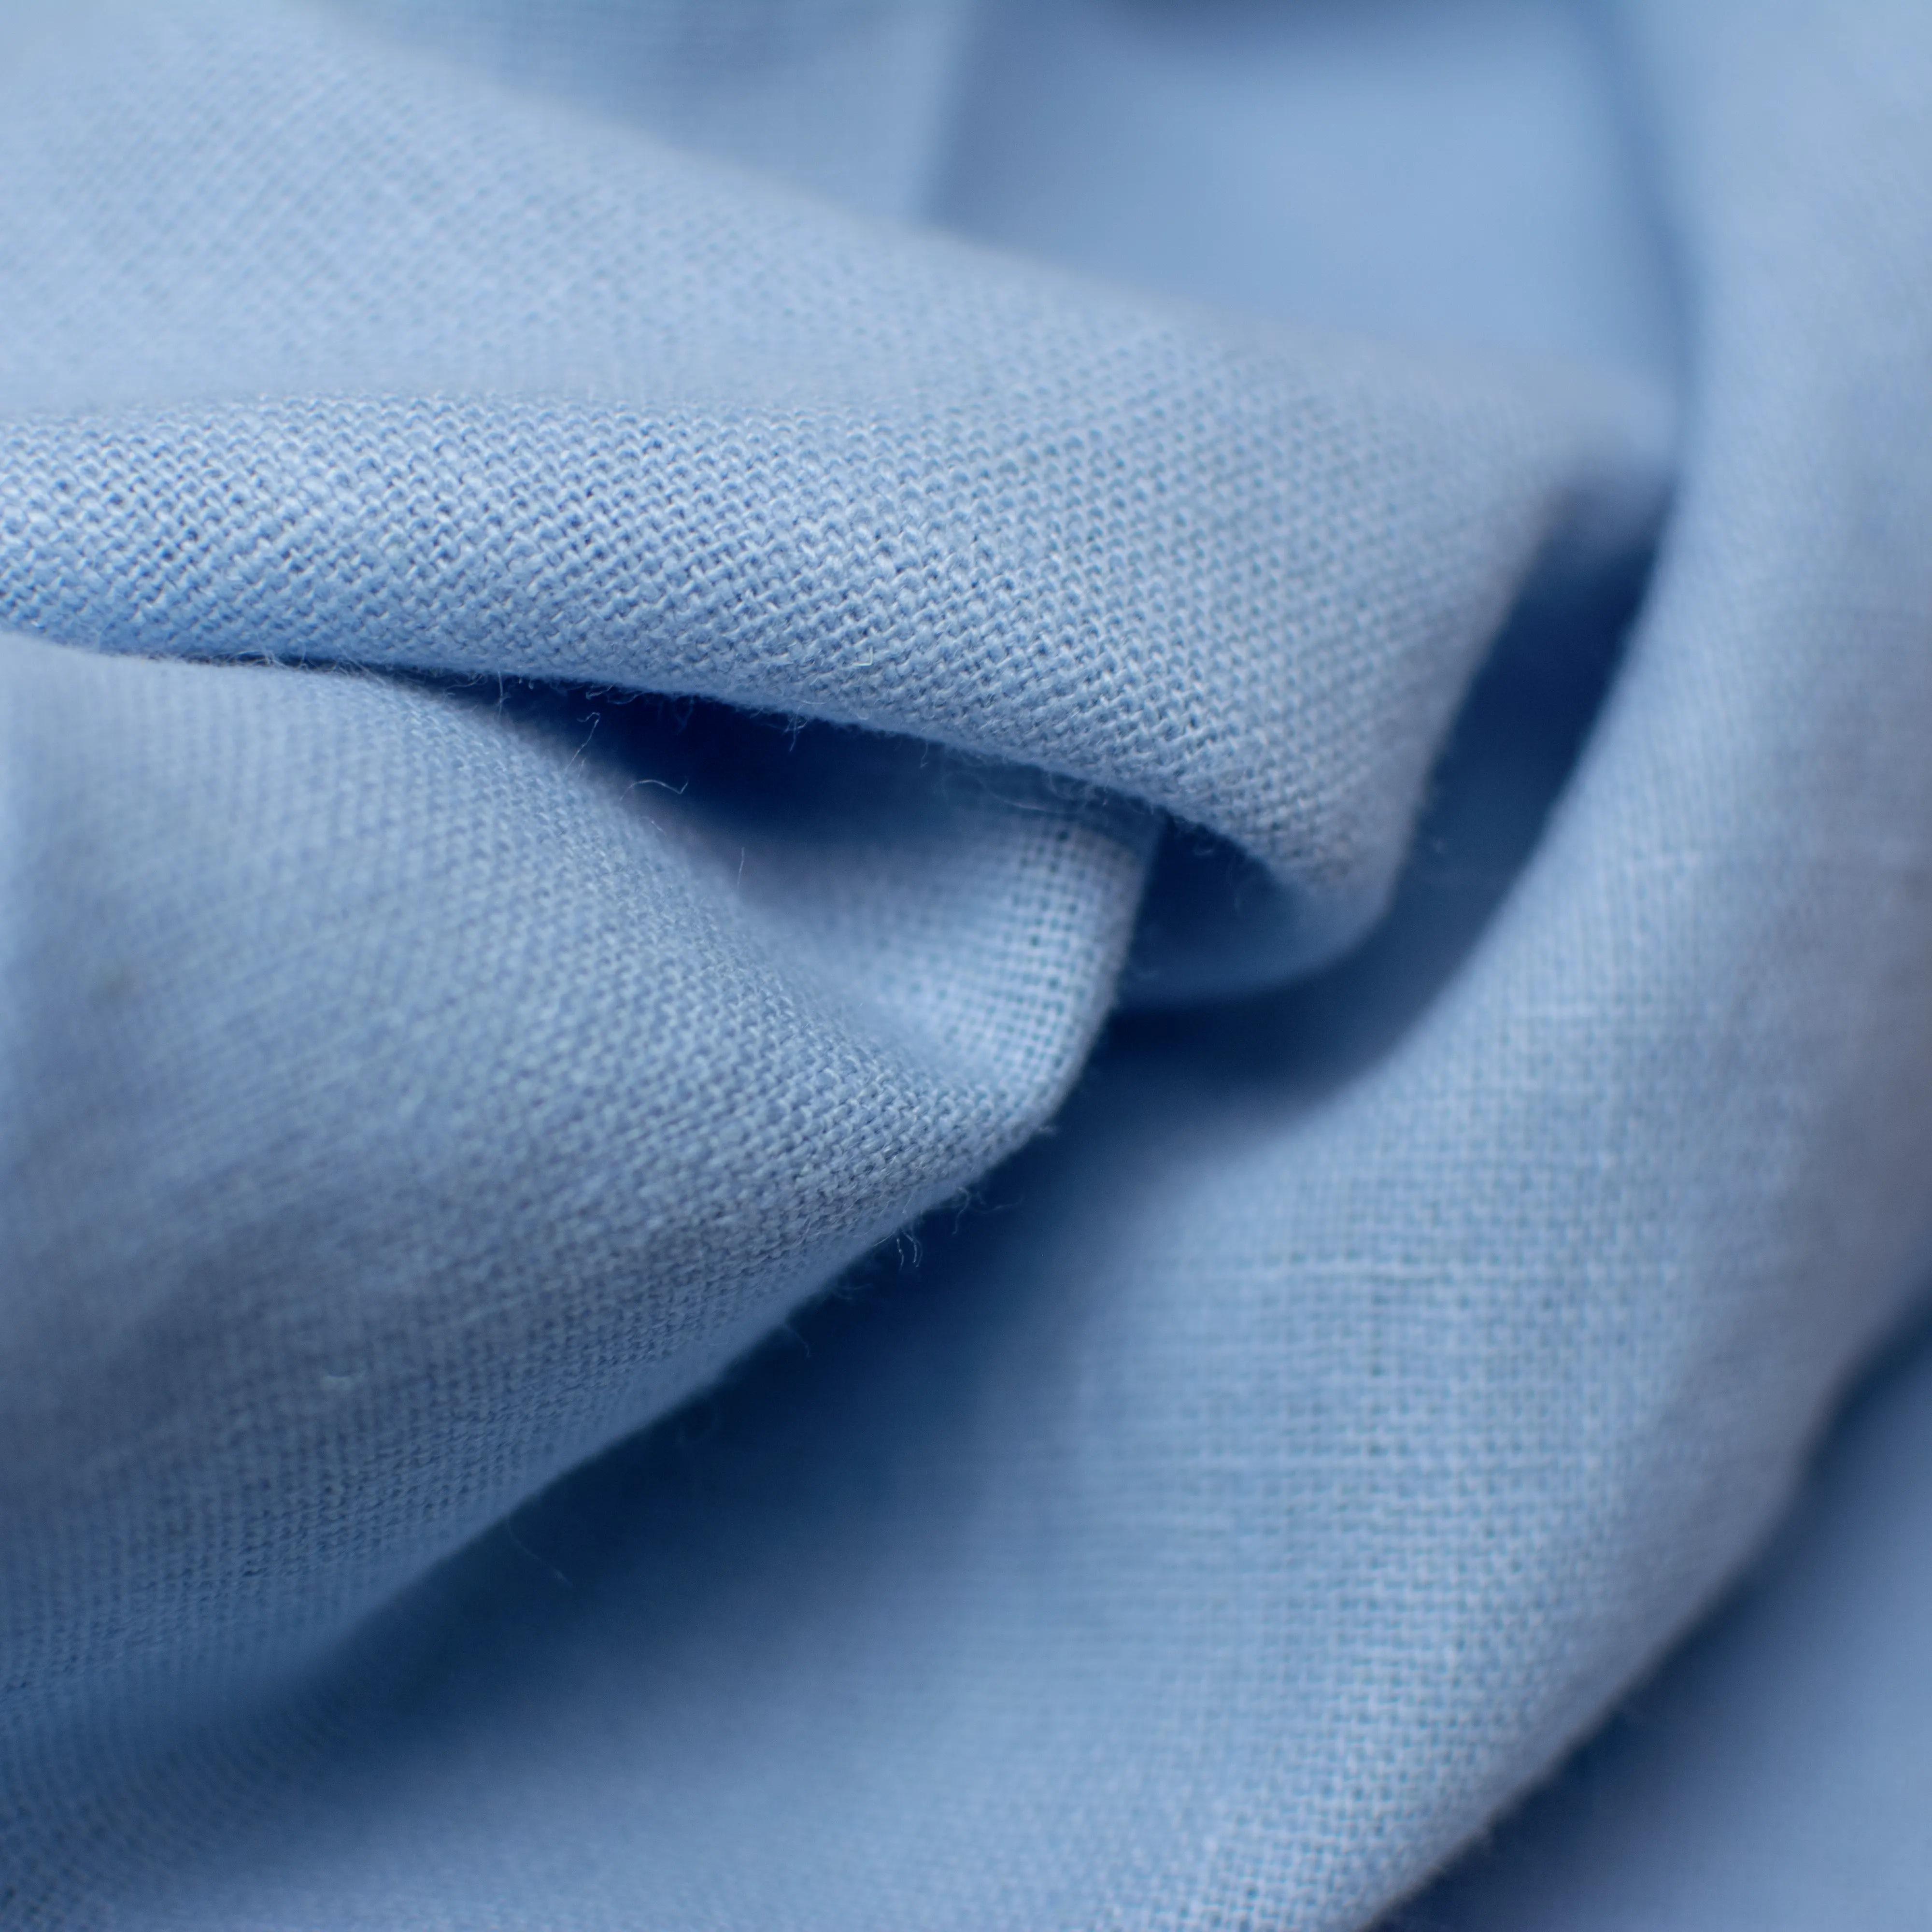 Leinen - Gewebe rustikal - himmelblau